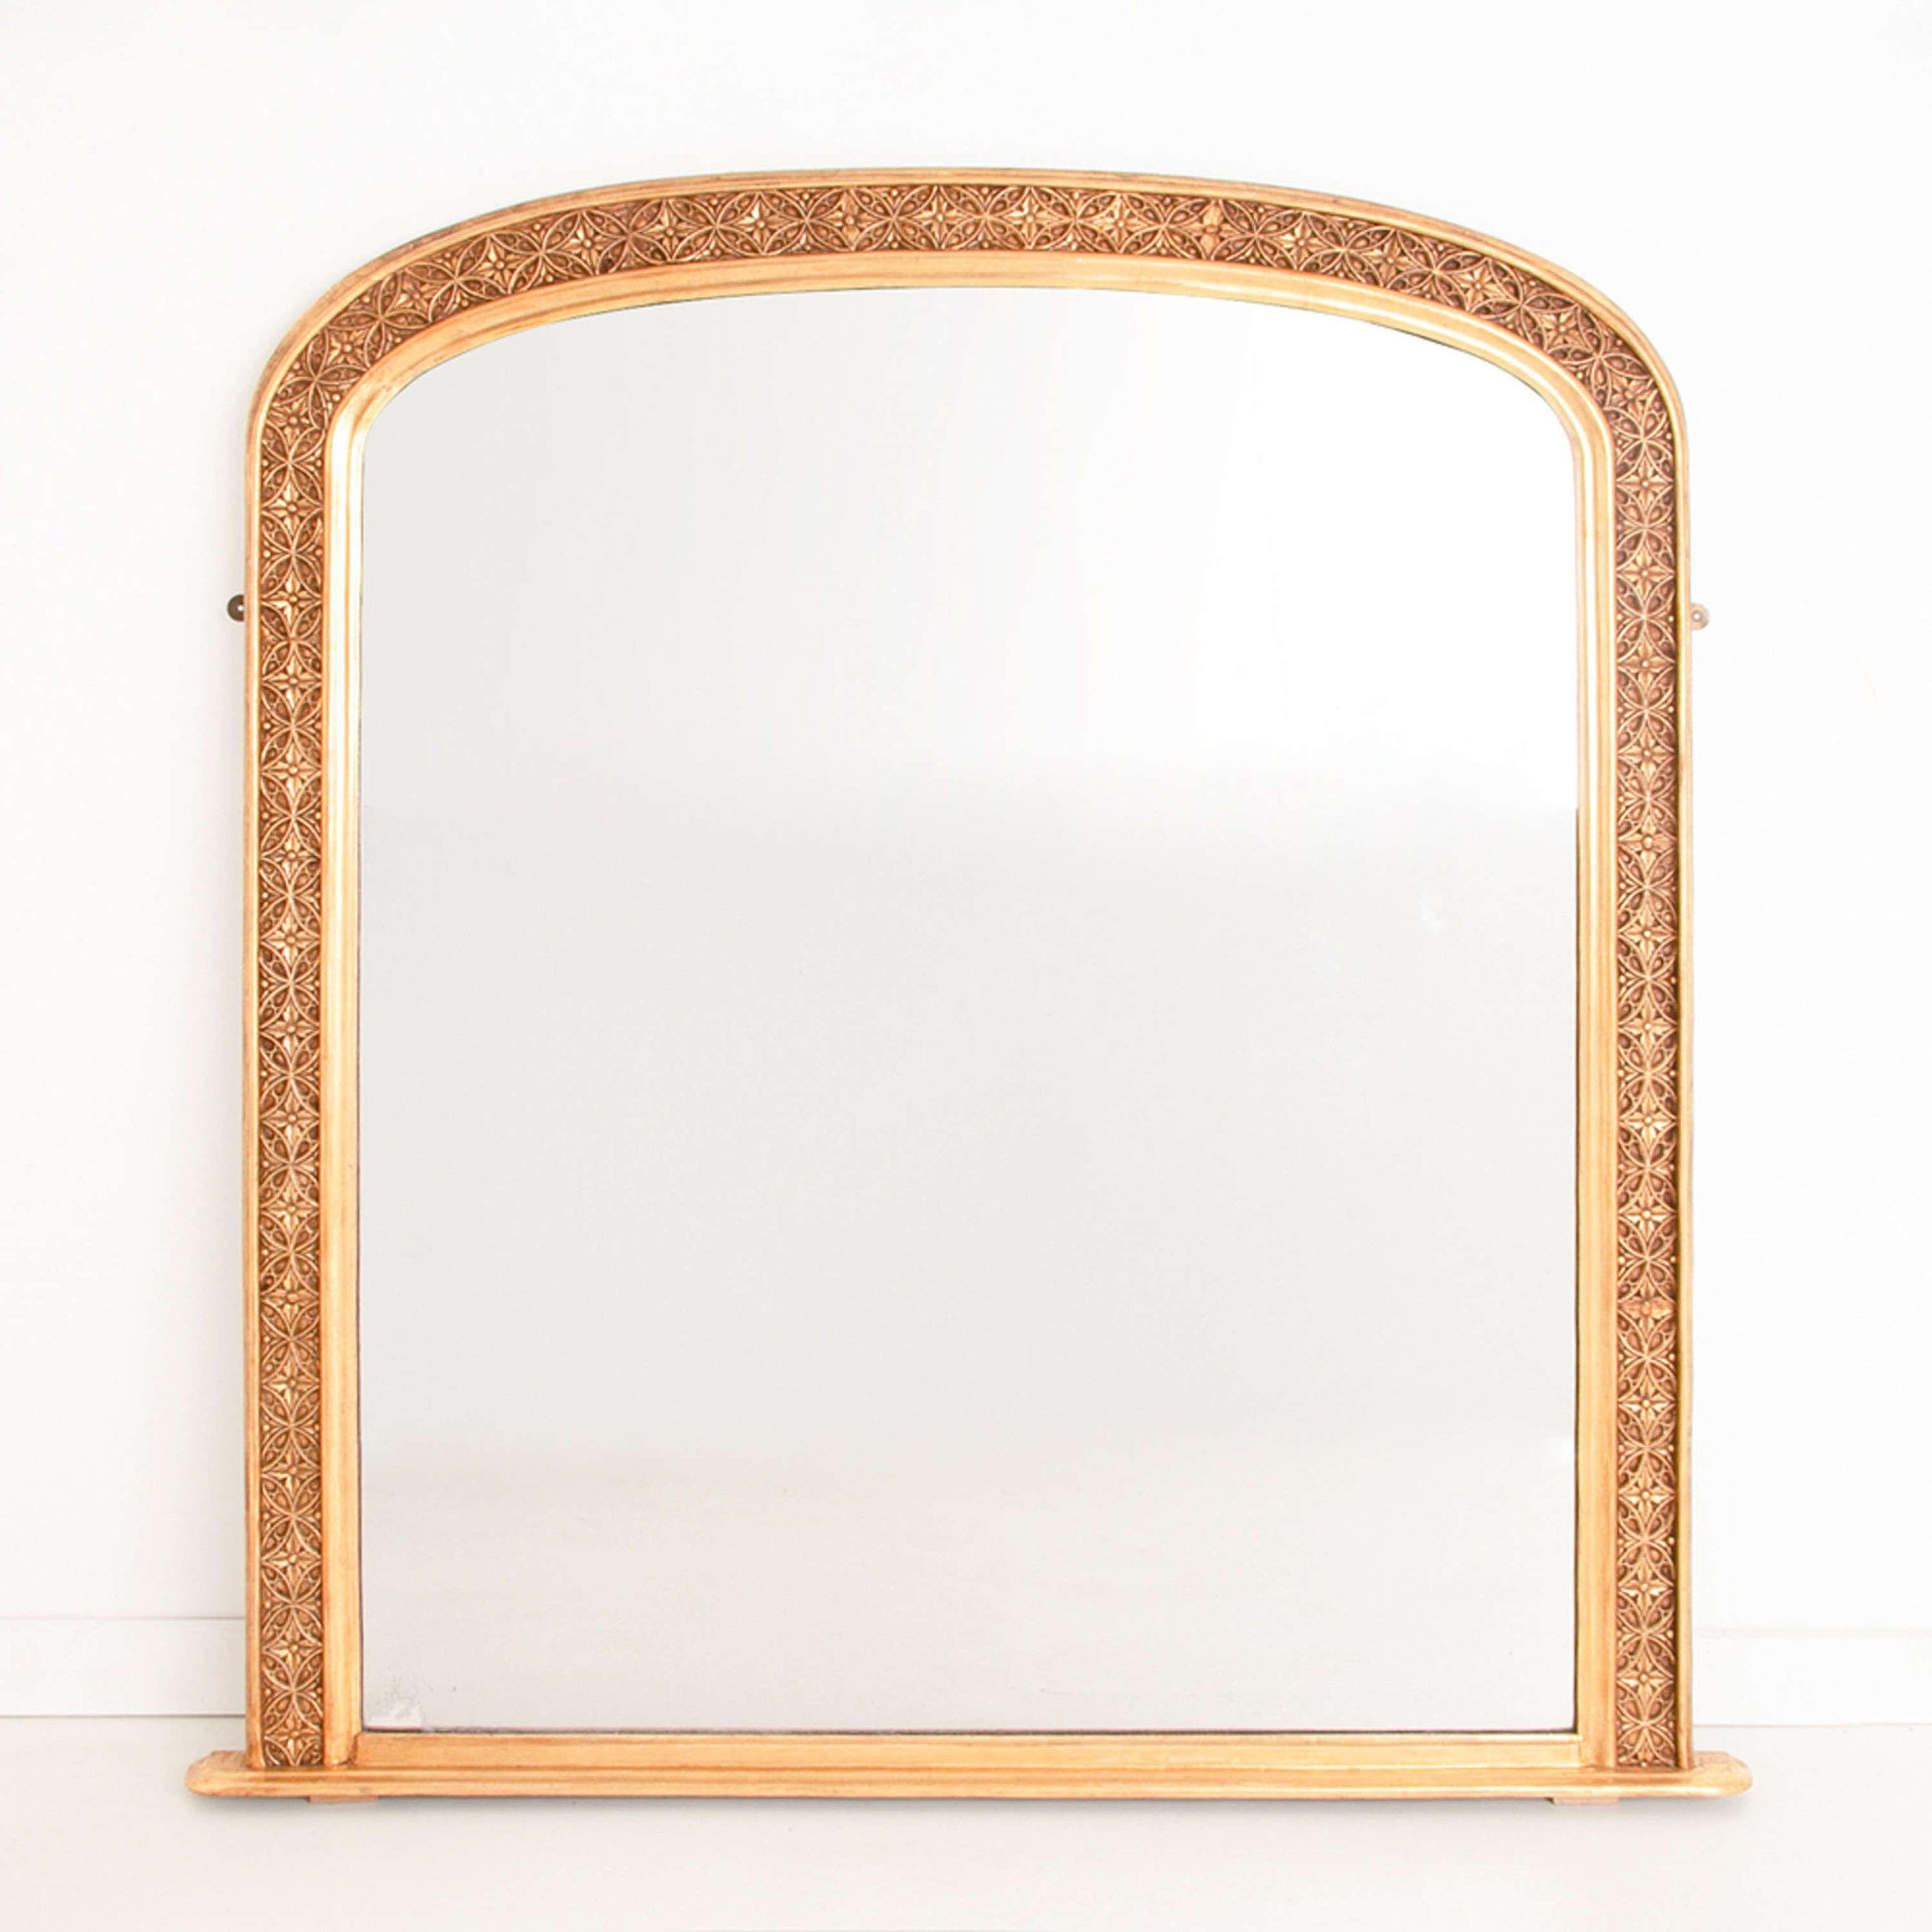 Antique Gilded Overmantle Mirror c.1840